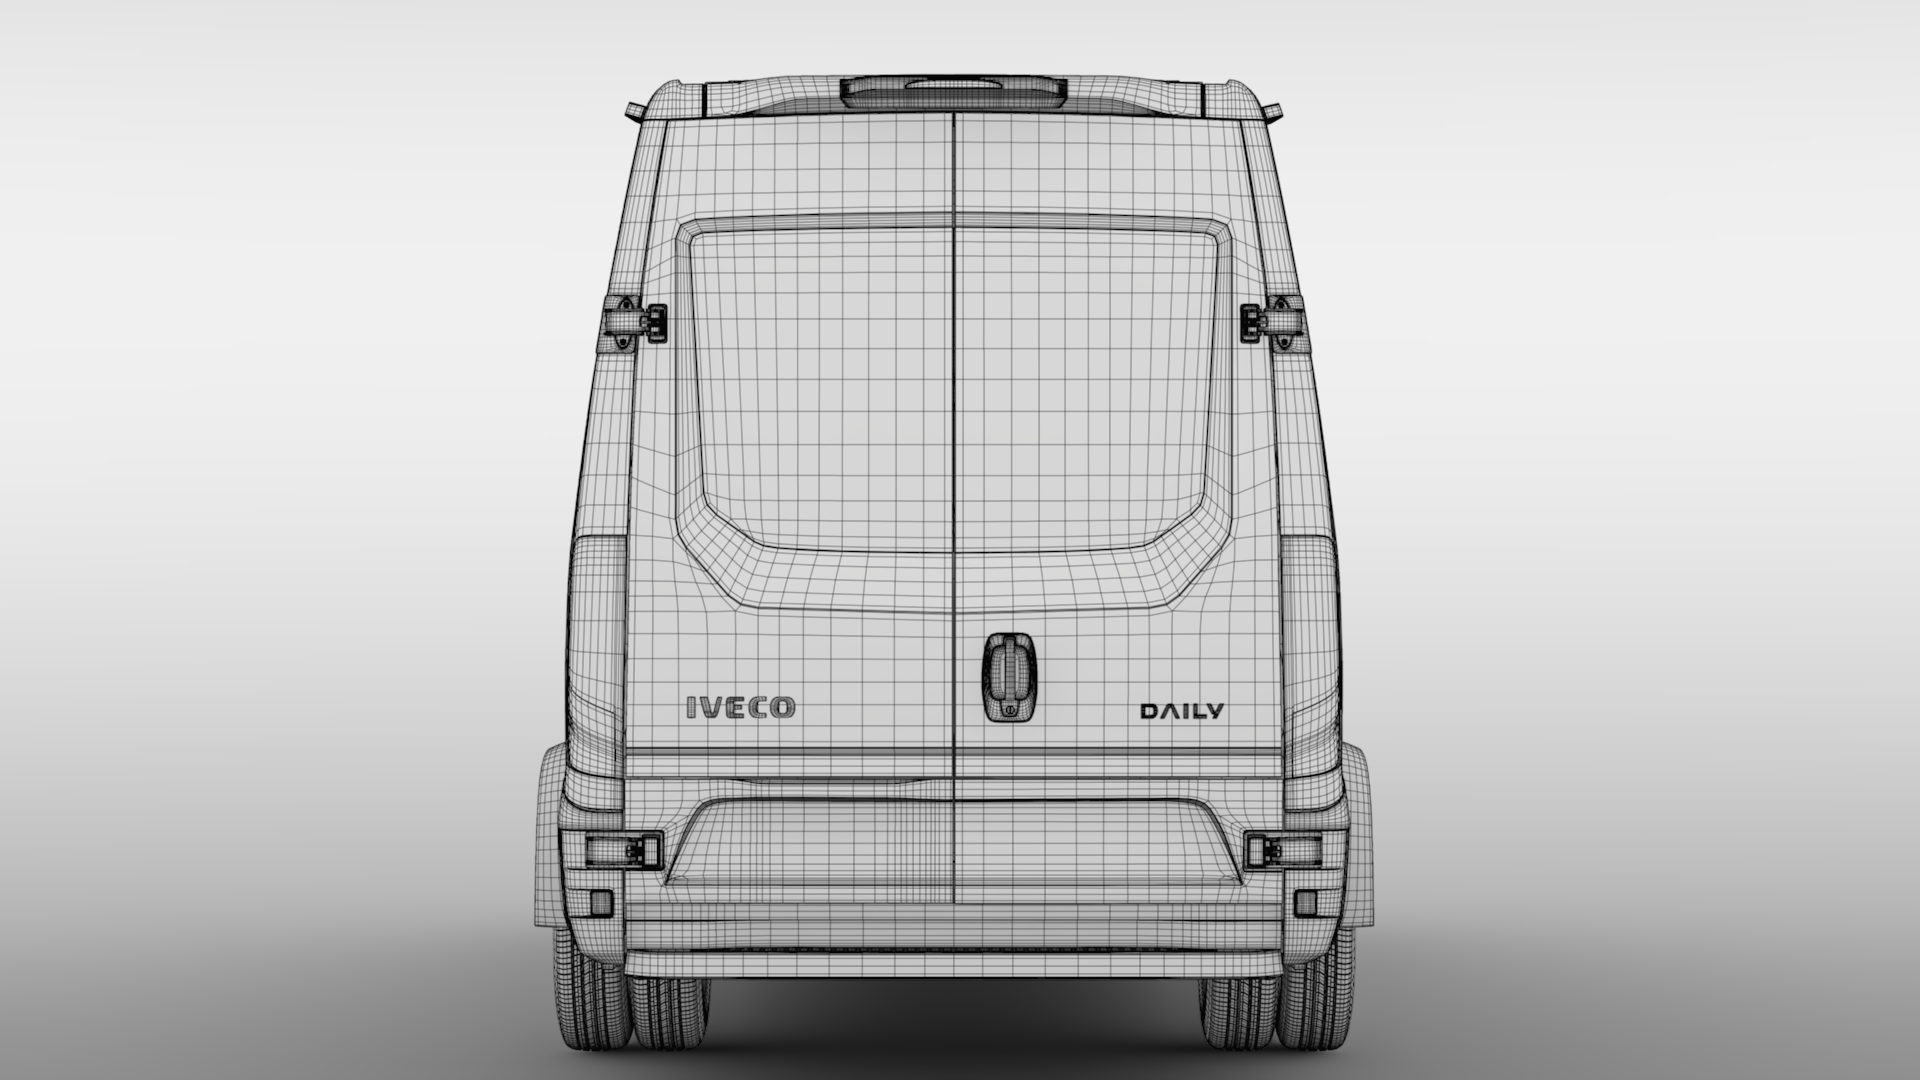 iveco daily minibus l3h2 2014-2016 3d model max fbx c4d lwo ma mb hrc xsi obj 276058